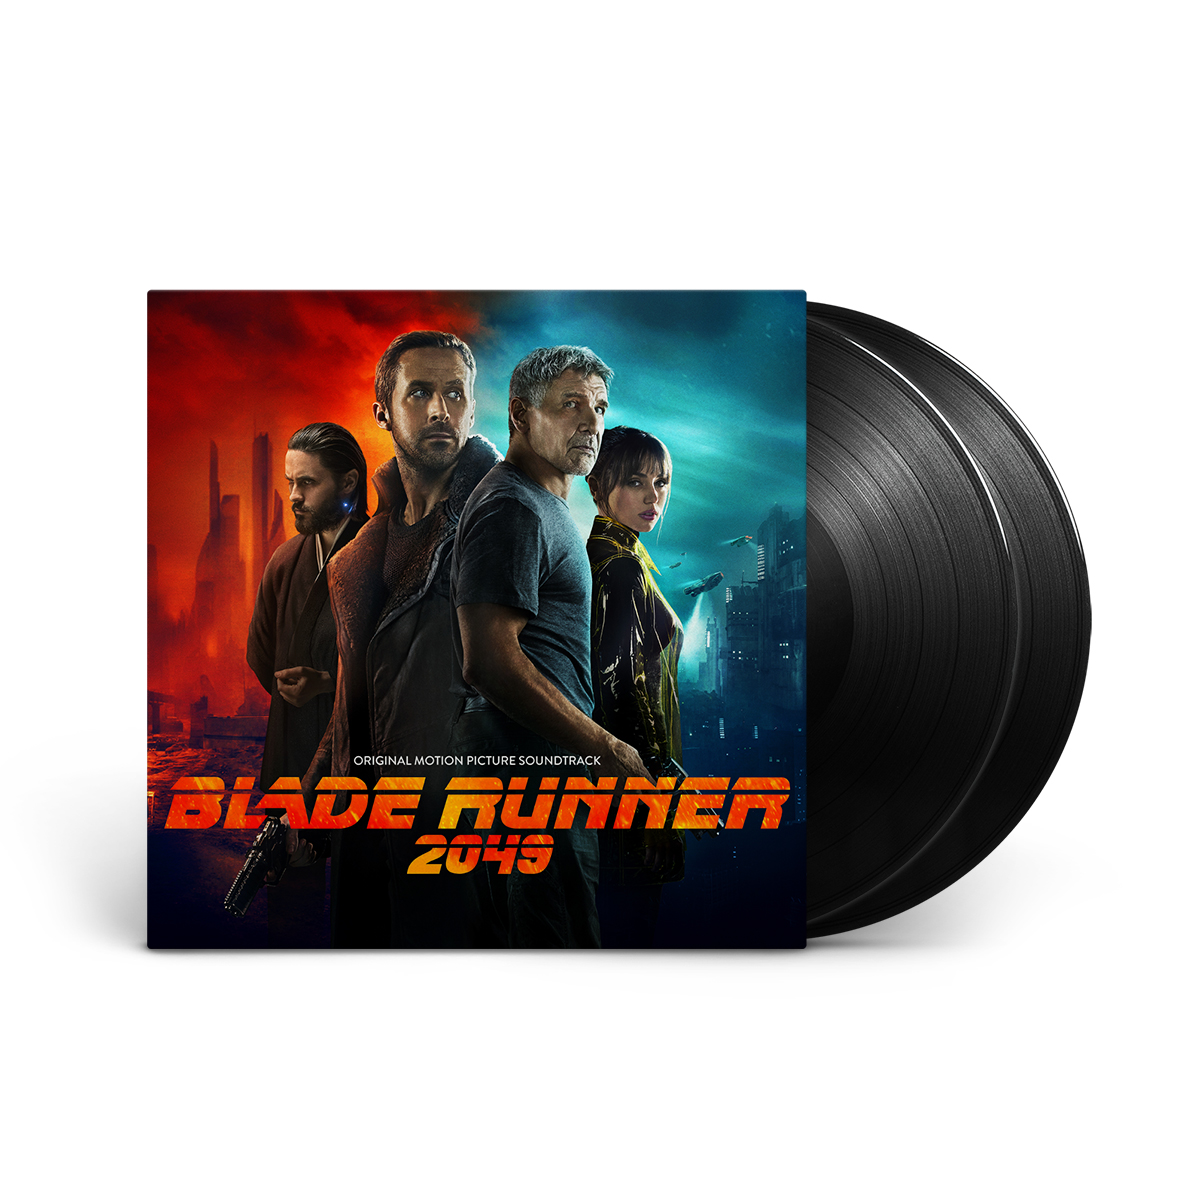 Blade Runner 2049 (Original Motion Picture Soundtrack) Audiophile Listening Edition 2-Disc Vinyl LP